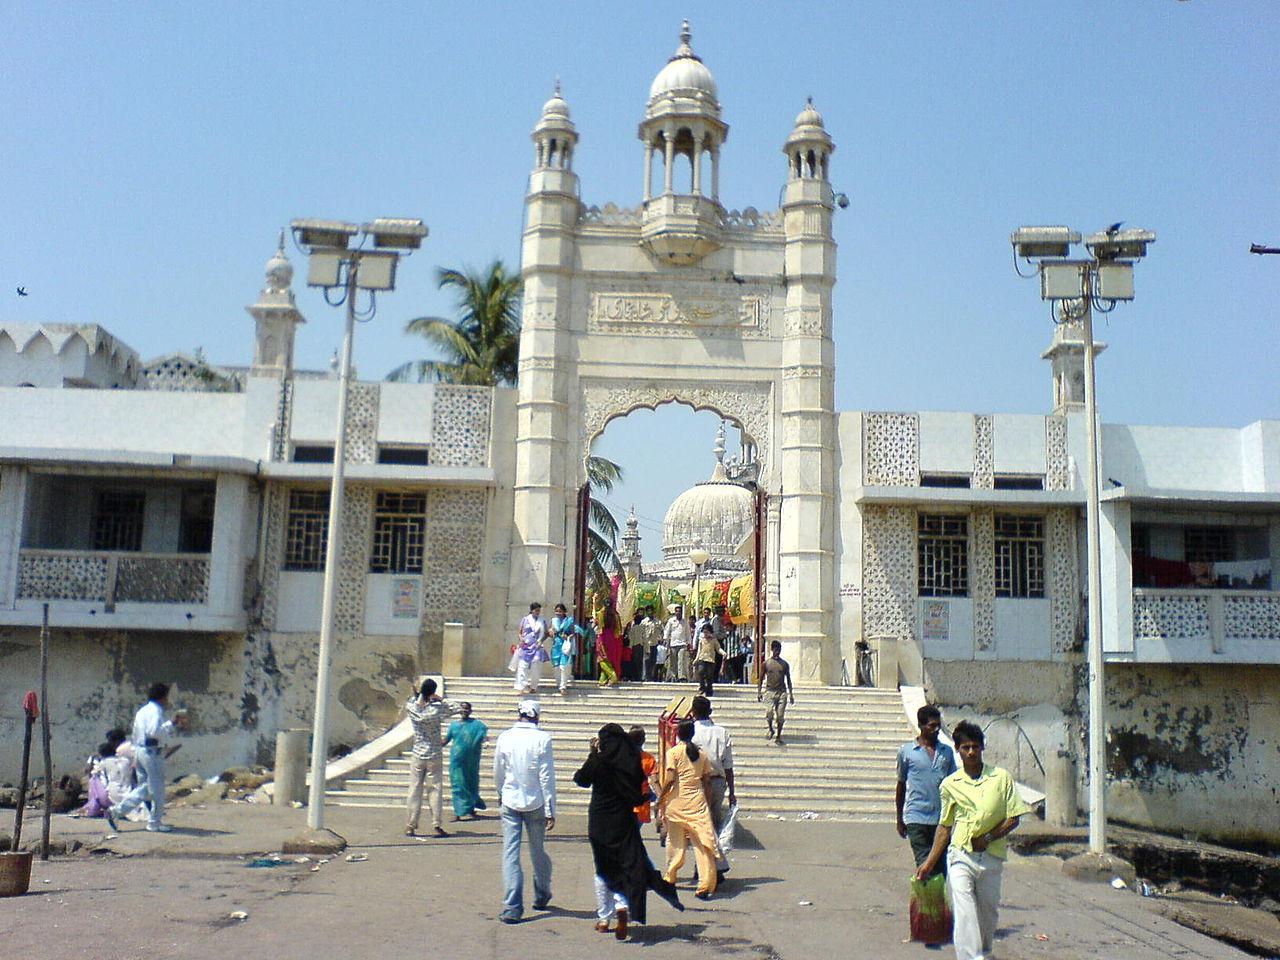 The Haji Ali Experience in Mumbai